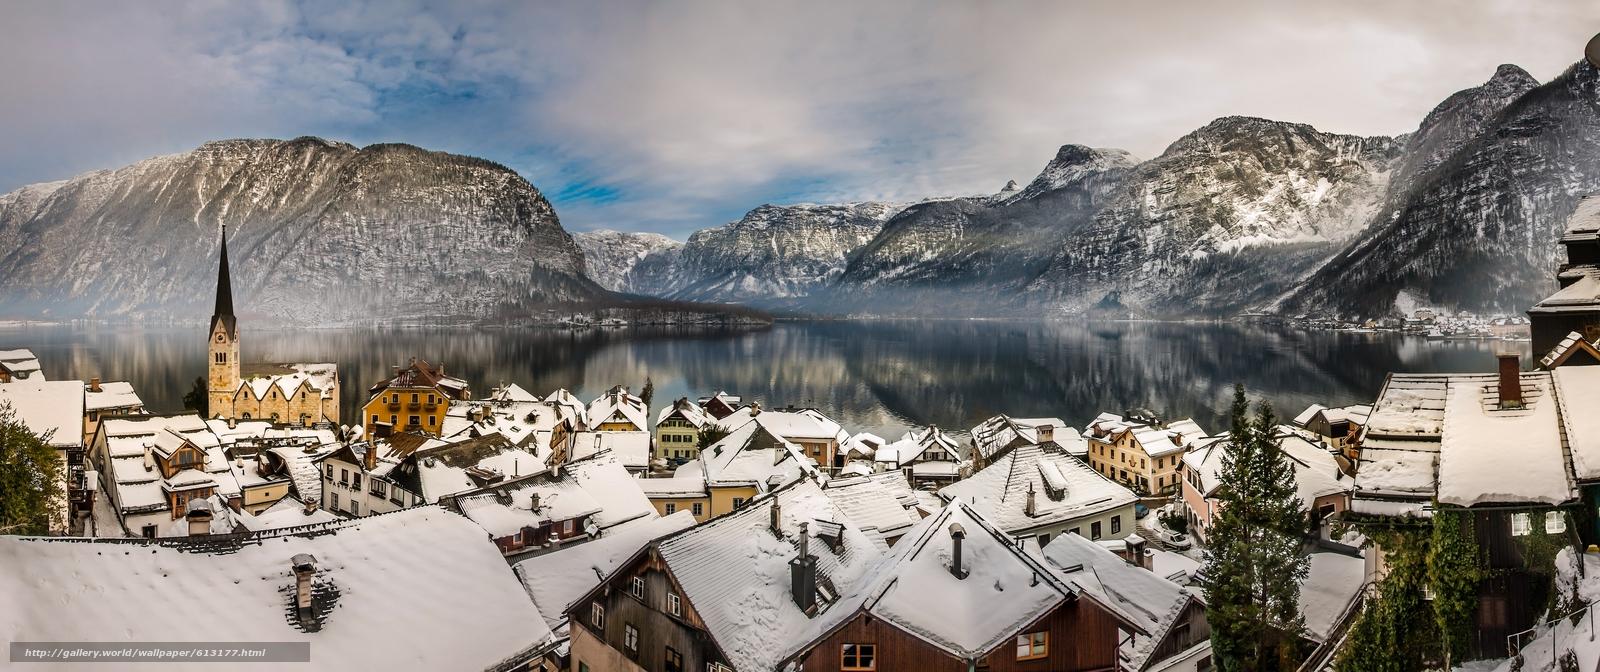 Download wallpaper Hallstatt,  Austria,  Lake Hallstatt,  Alps free desktop wallpaper in the resolution 5000x2099 — picture №613177